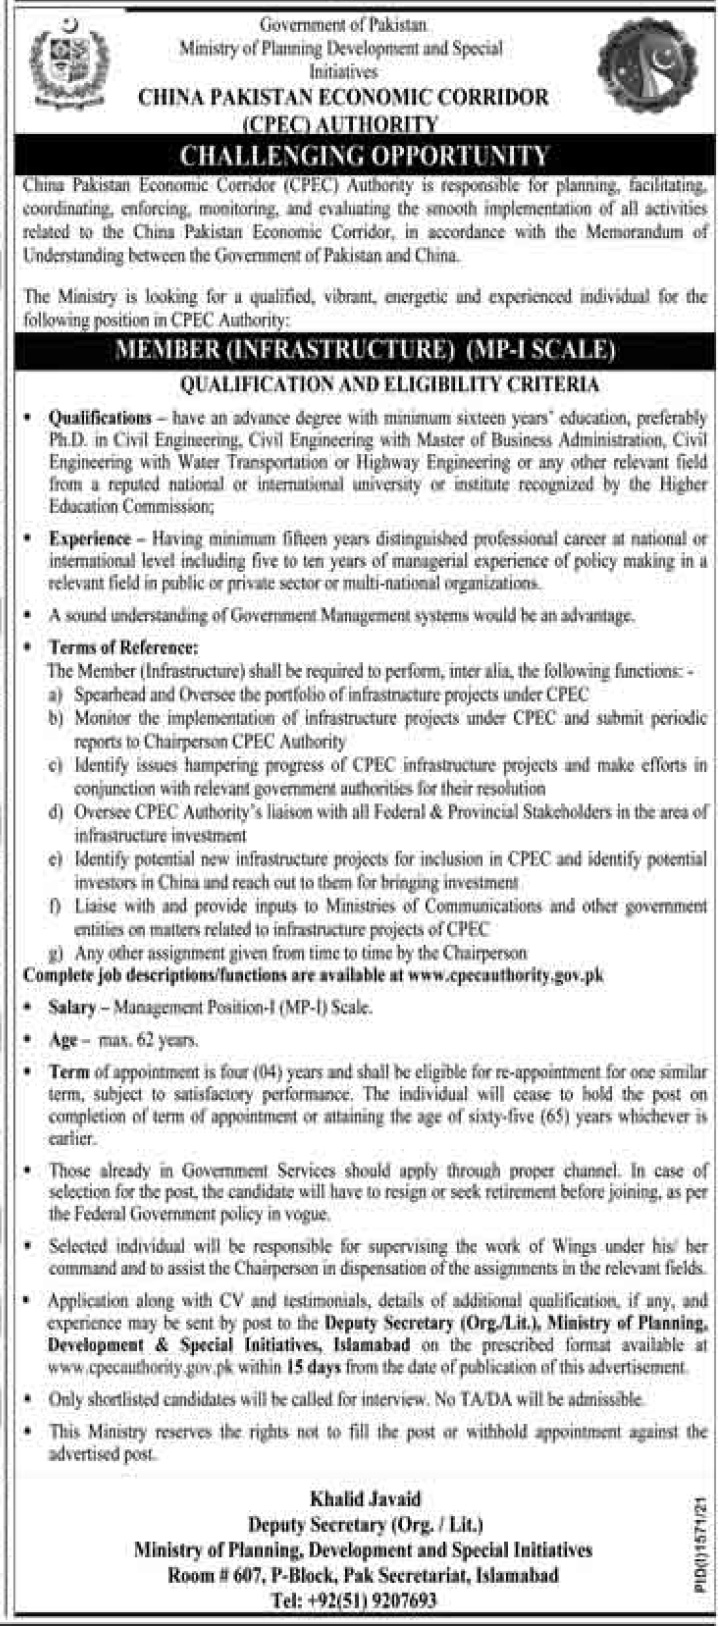 China Pakistan Economic Corridor CPEC Jobs 2021 | Board of Investment Govt of Pakistan Jobs 2021